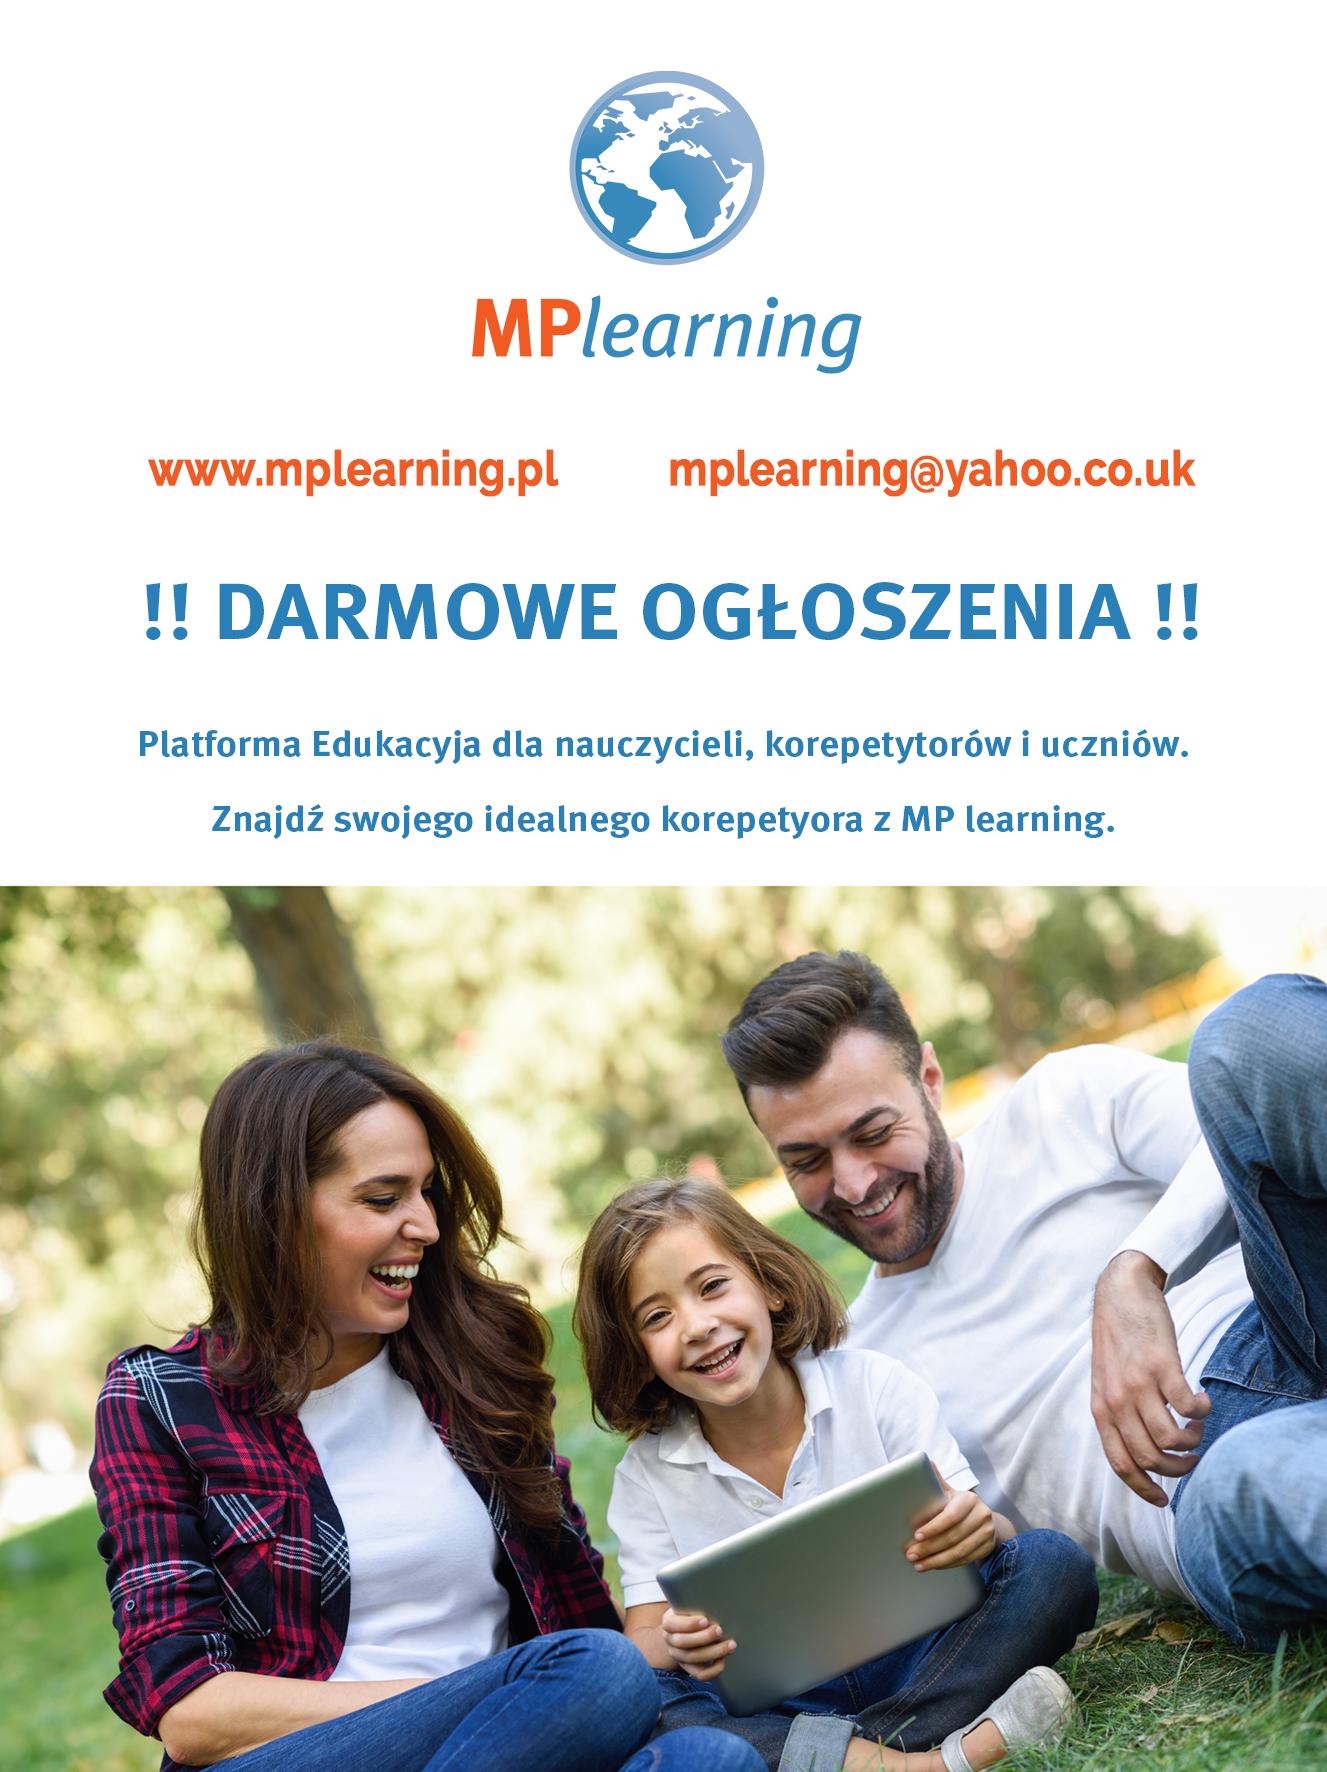 darmowe_ogloszenia_mplearning_plakat6